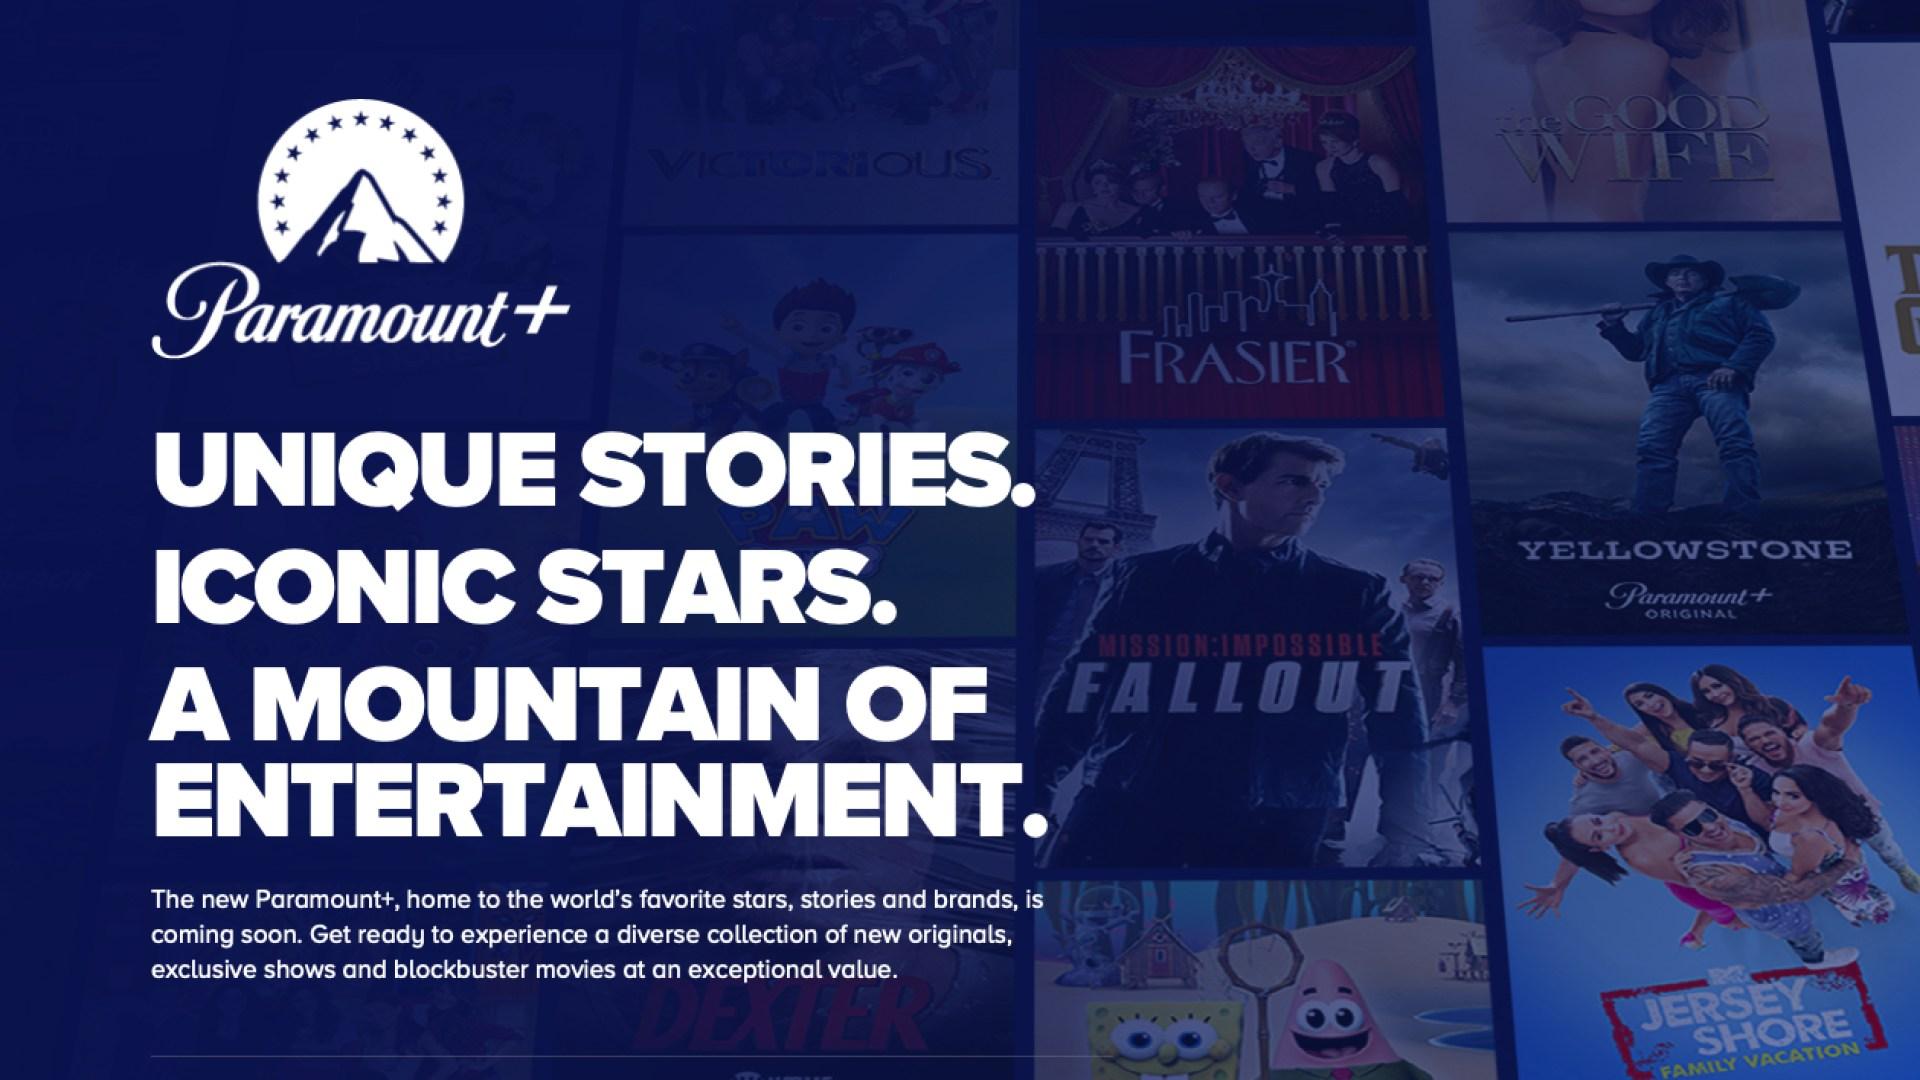 Cbs, Paramount, Viacom, CBS all Access, paramountplus